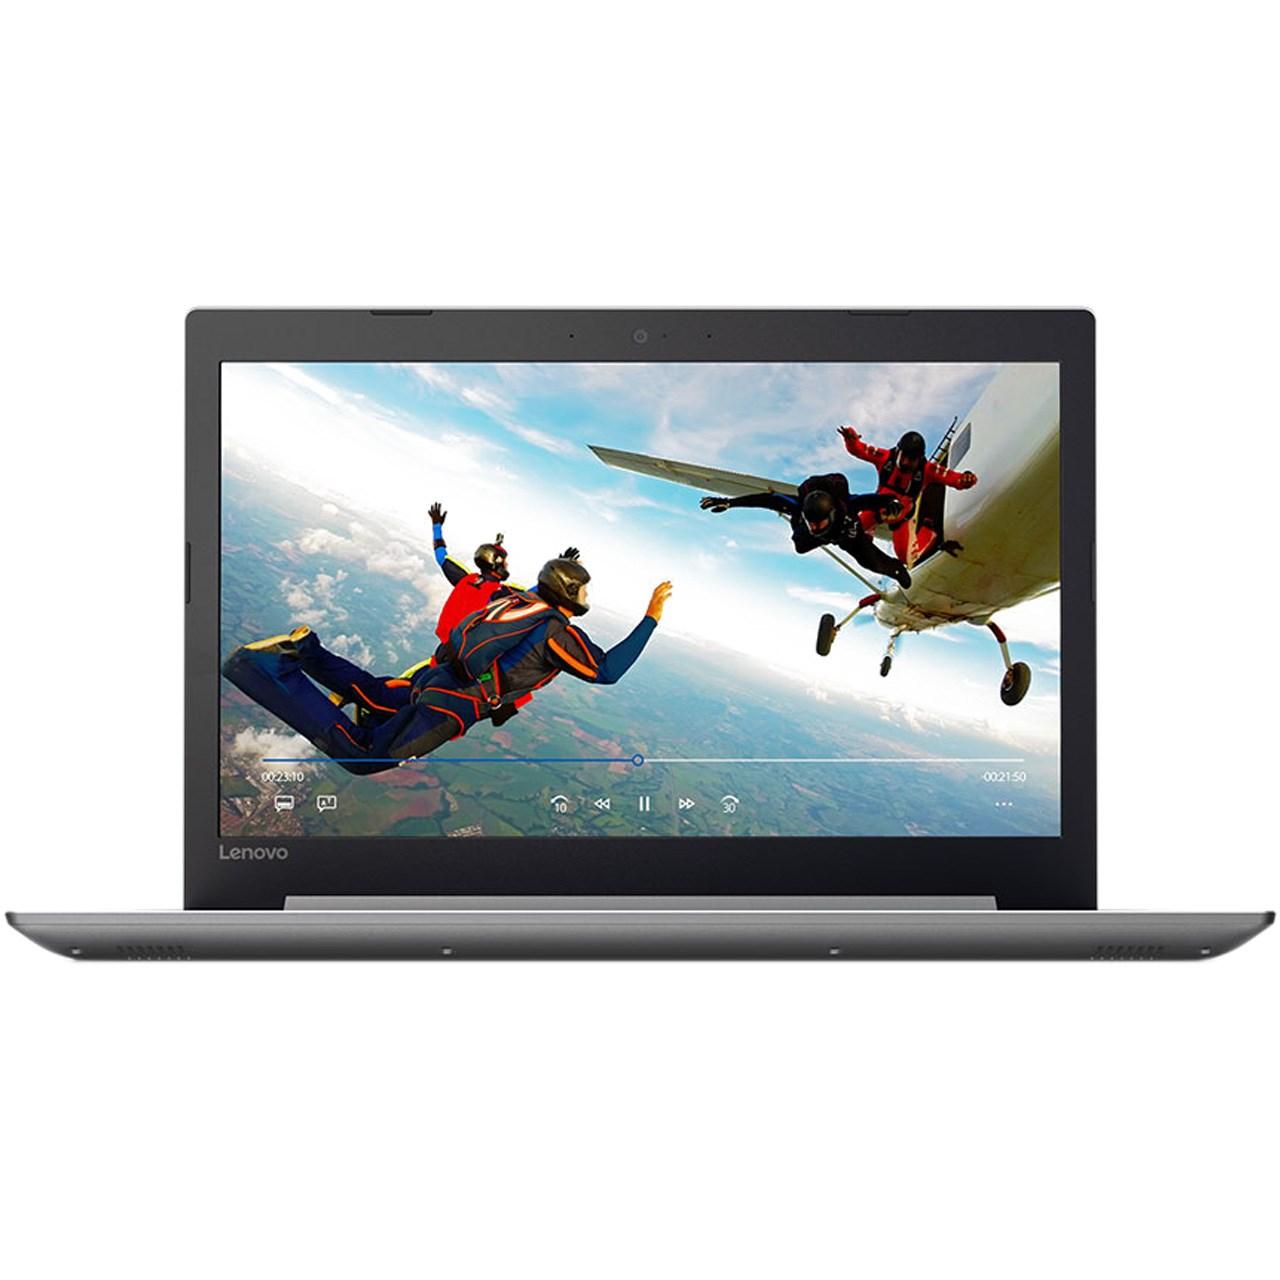 لپ تاپ 15 اینچی لنوو مدل Ideapad 320 - G